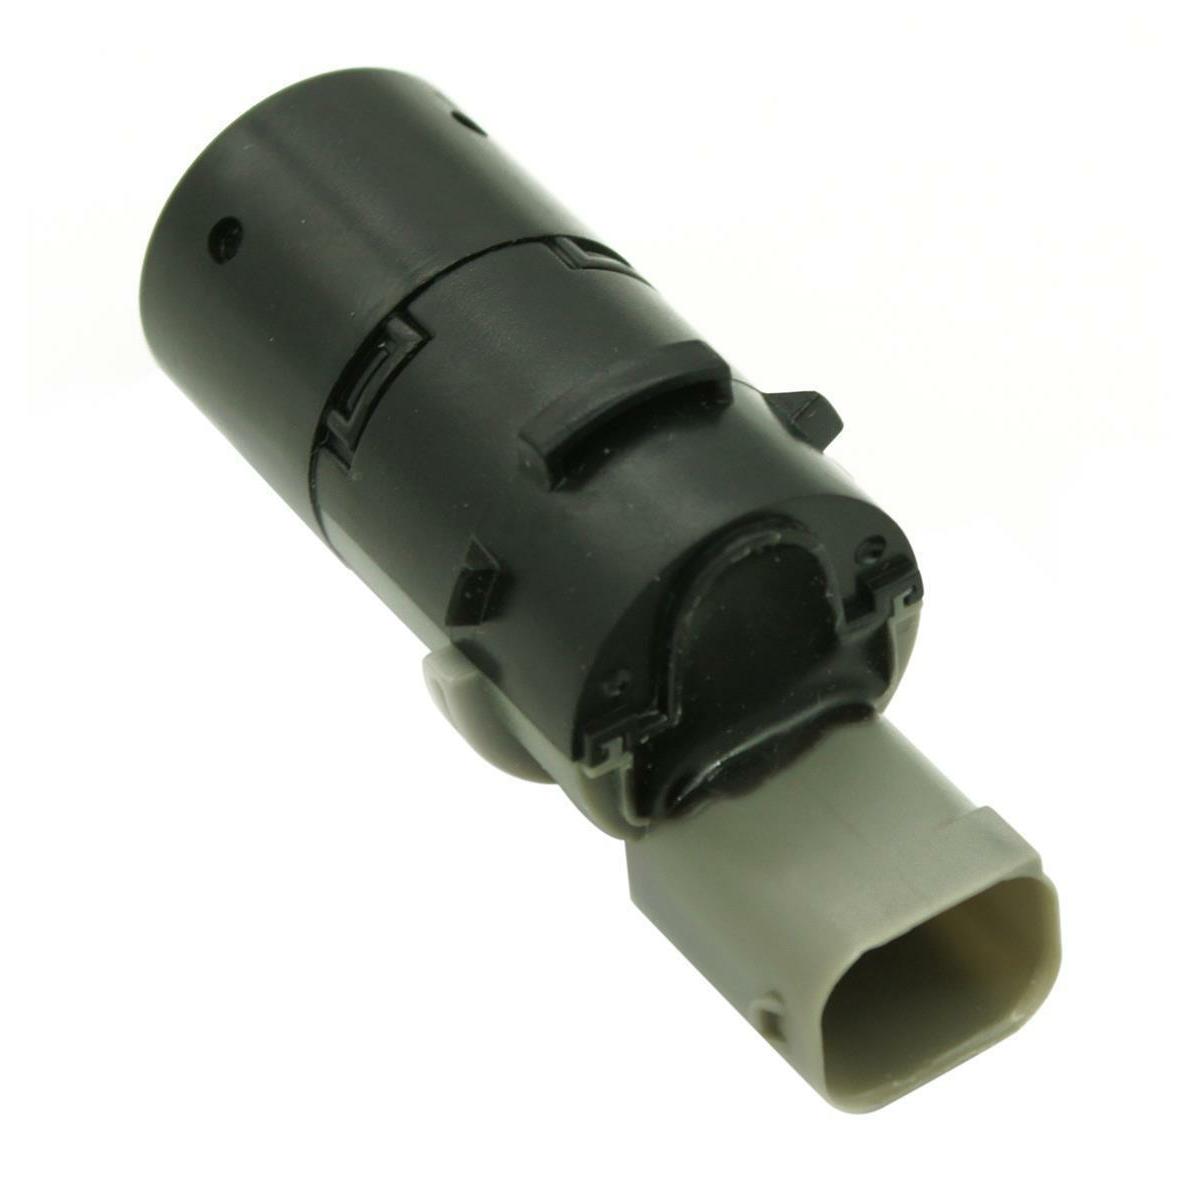 Park sensor 66206938739 for BMW PDC Parktronic